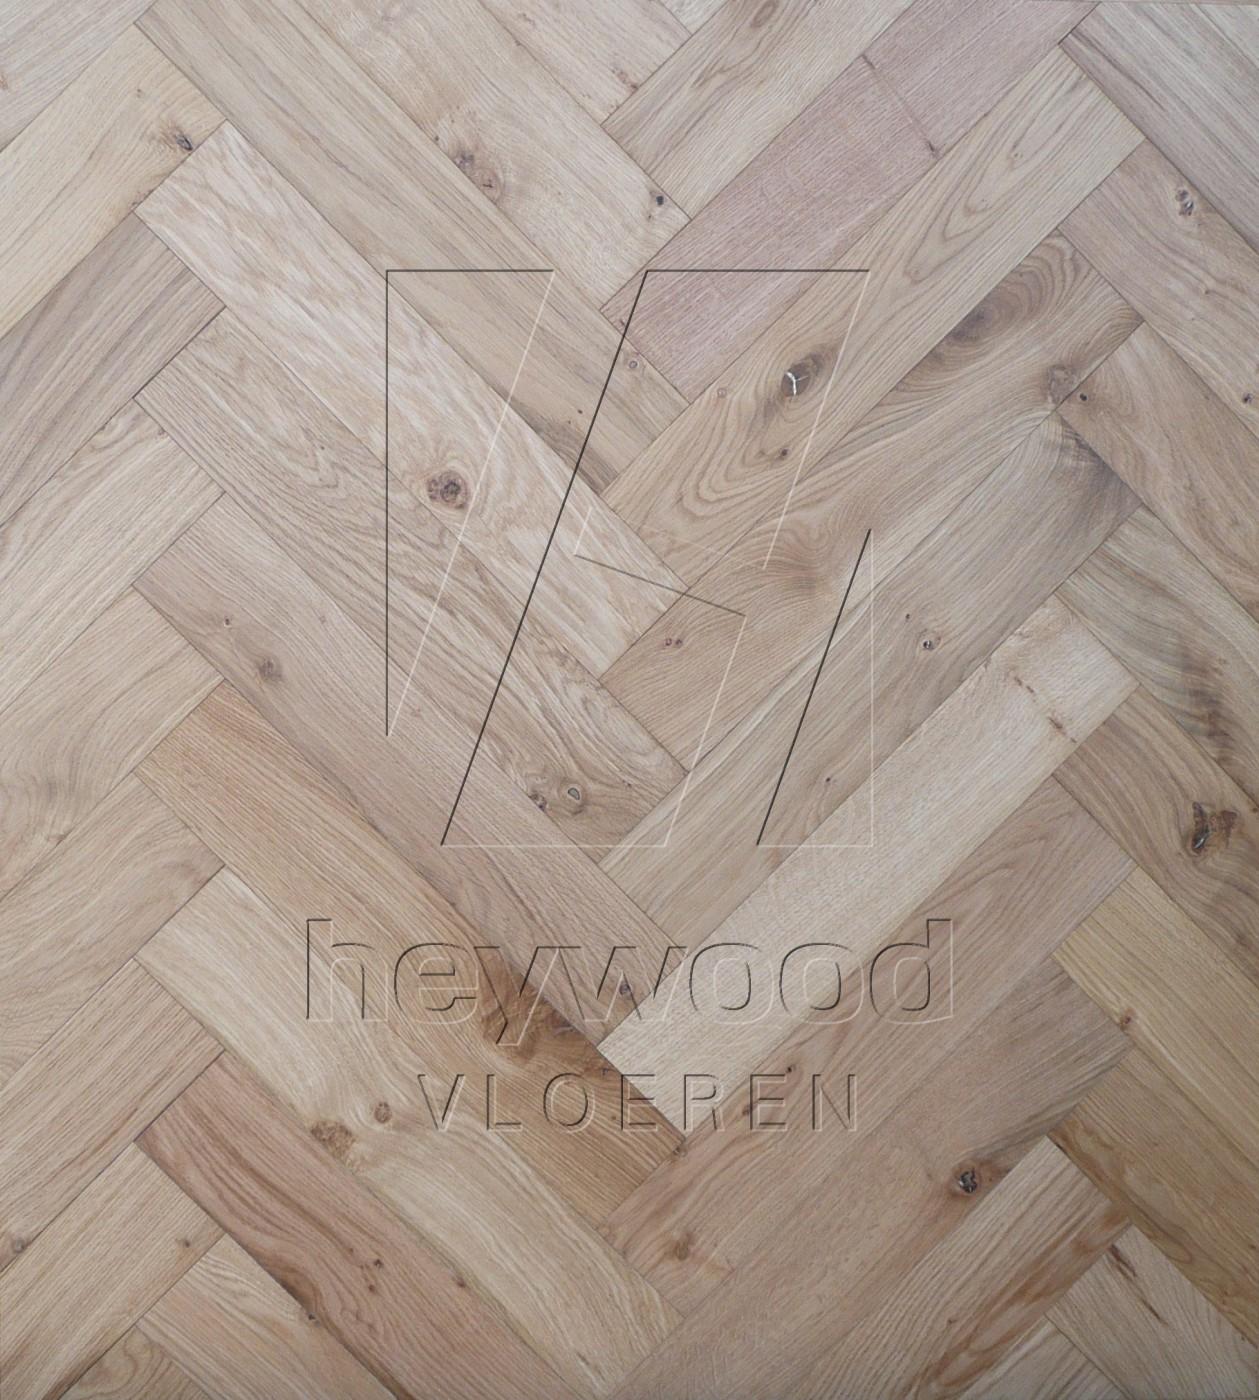 Herringbone Oak Rustic-A Osmo oiled in Herringbone of Pattern & Panel Floors